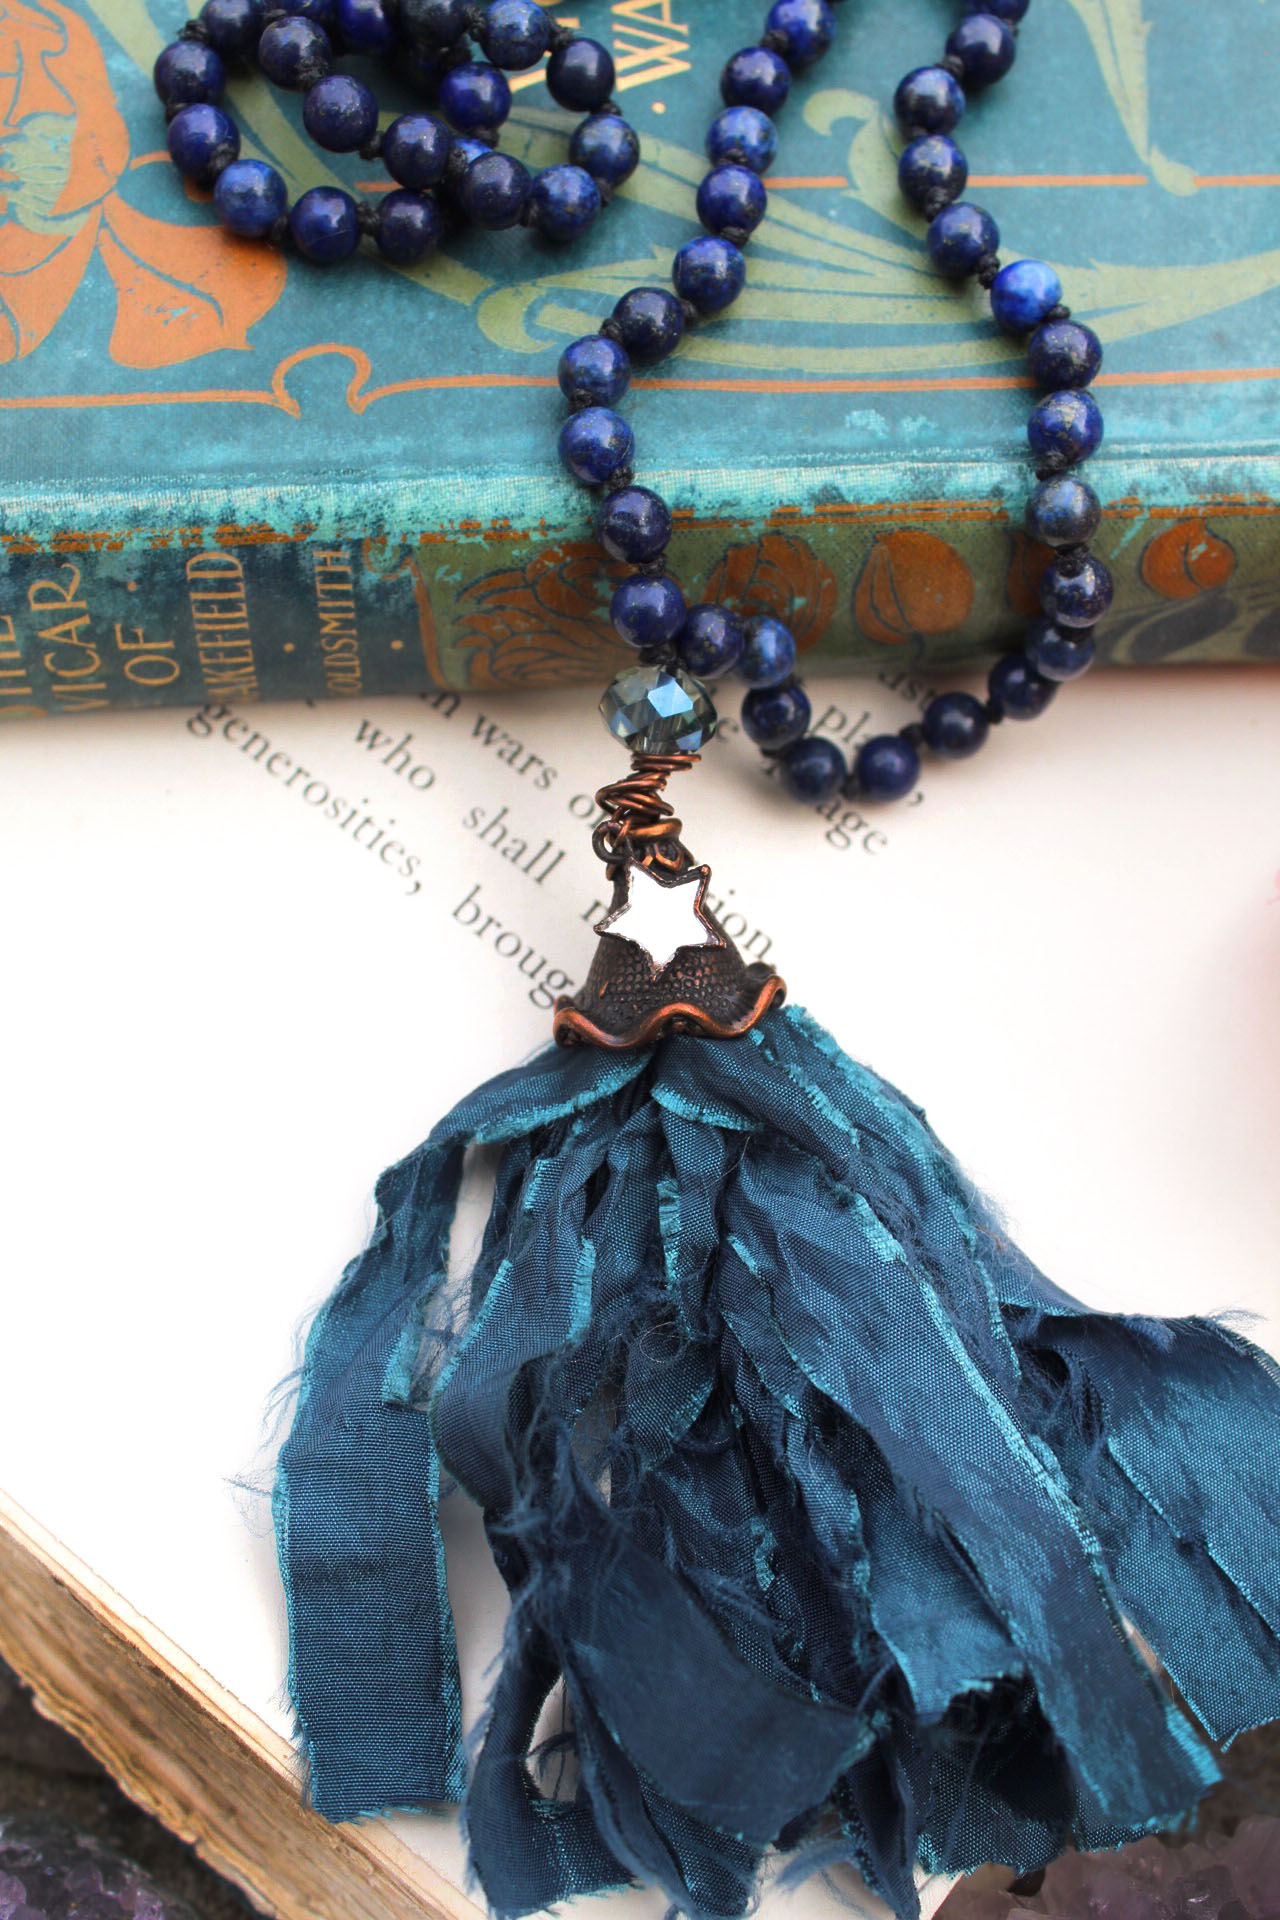 Lapis Lazuli Beaded Tassel Necklace with Pretty Mirror Star Charm – Mermaid Jewelry and Ocean Art